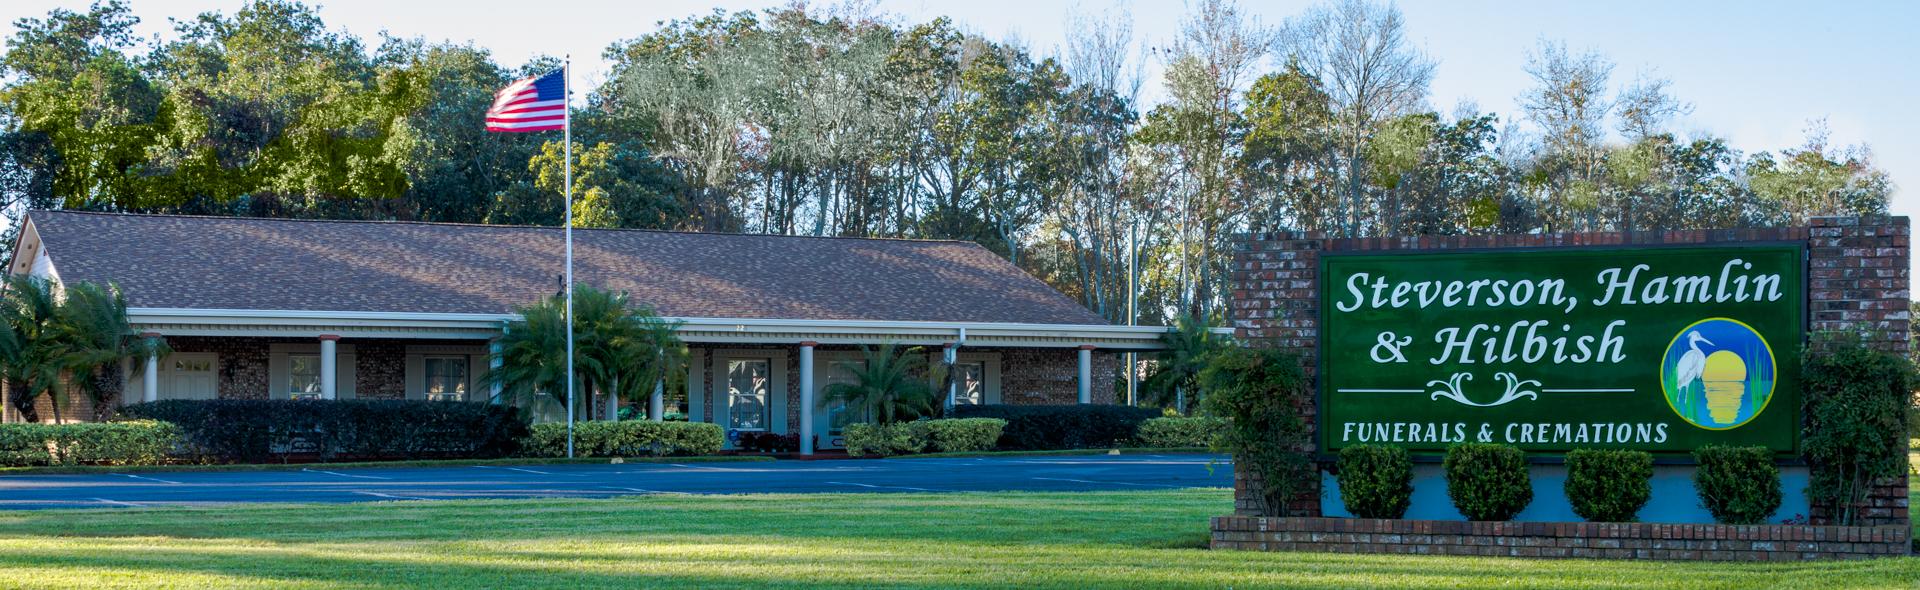 Steverson, Hamlin & Hilbish Funeral Home